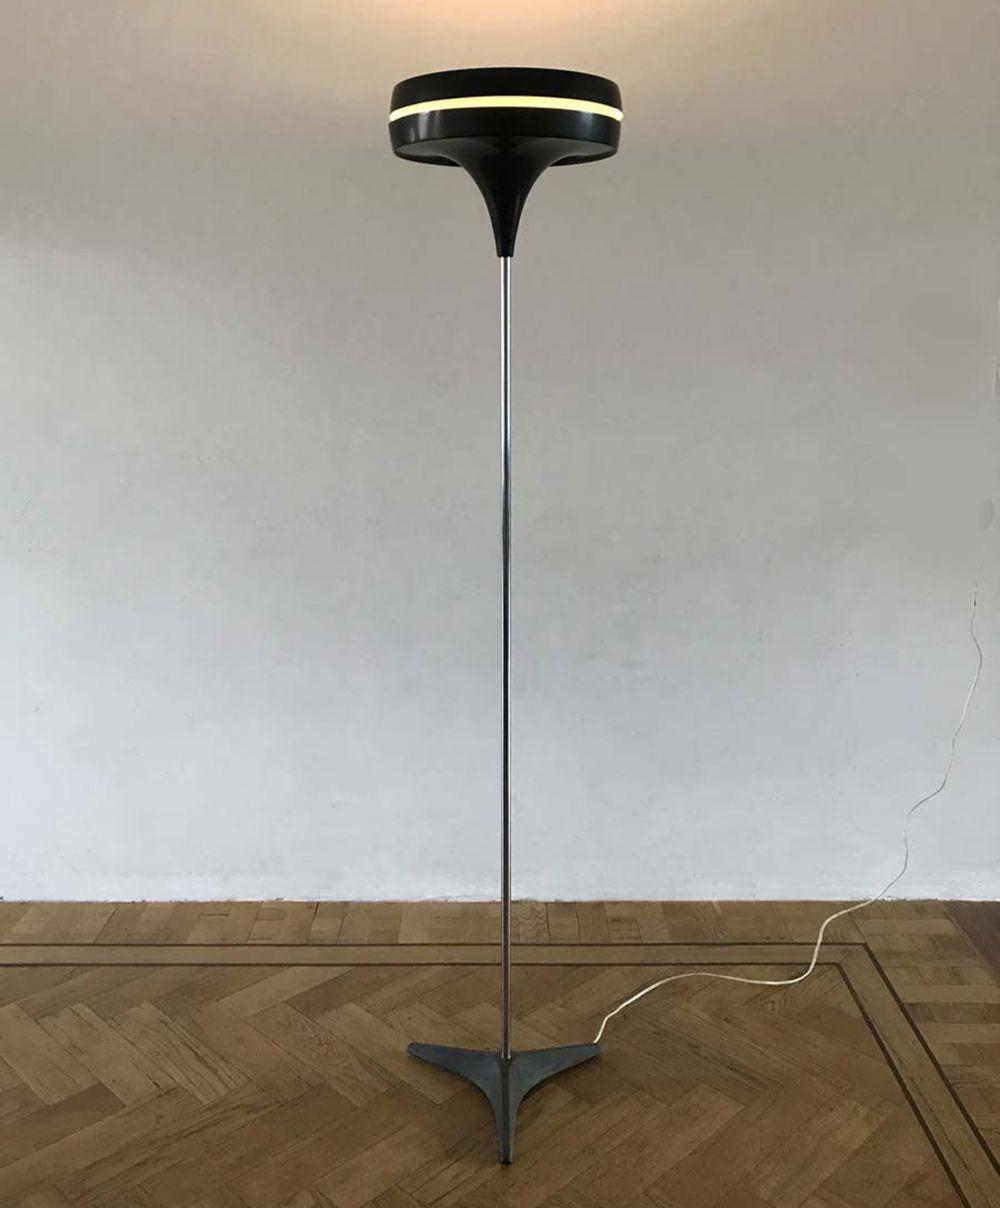 For Sale Rare Floor Lamp By Raak Amsterdam 1960 S Vntg Vintage In 2020 Floor Lamp Lamp Globe Floor Lamp